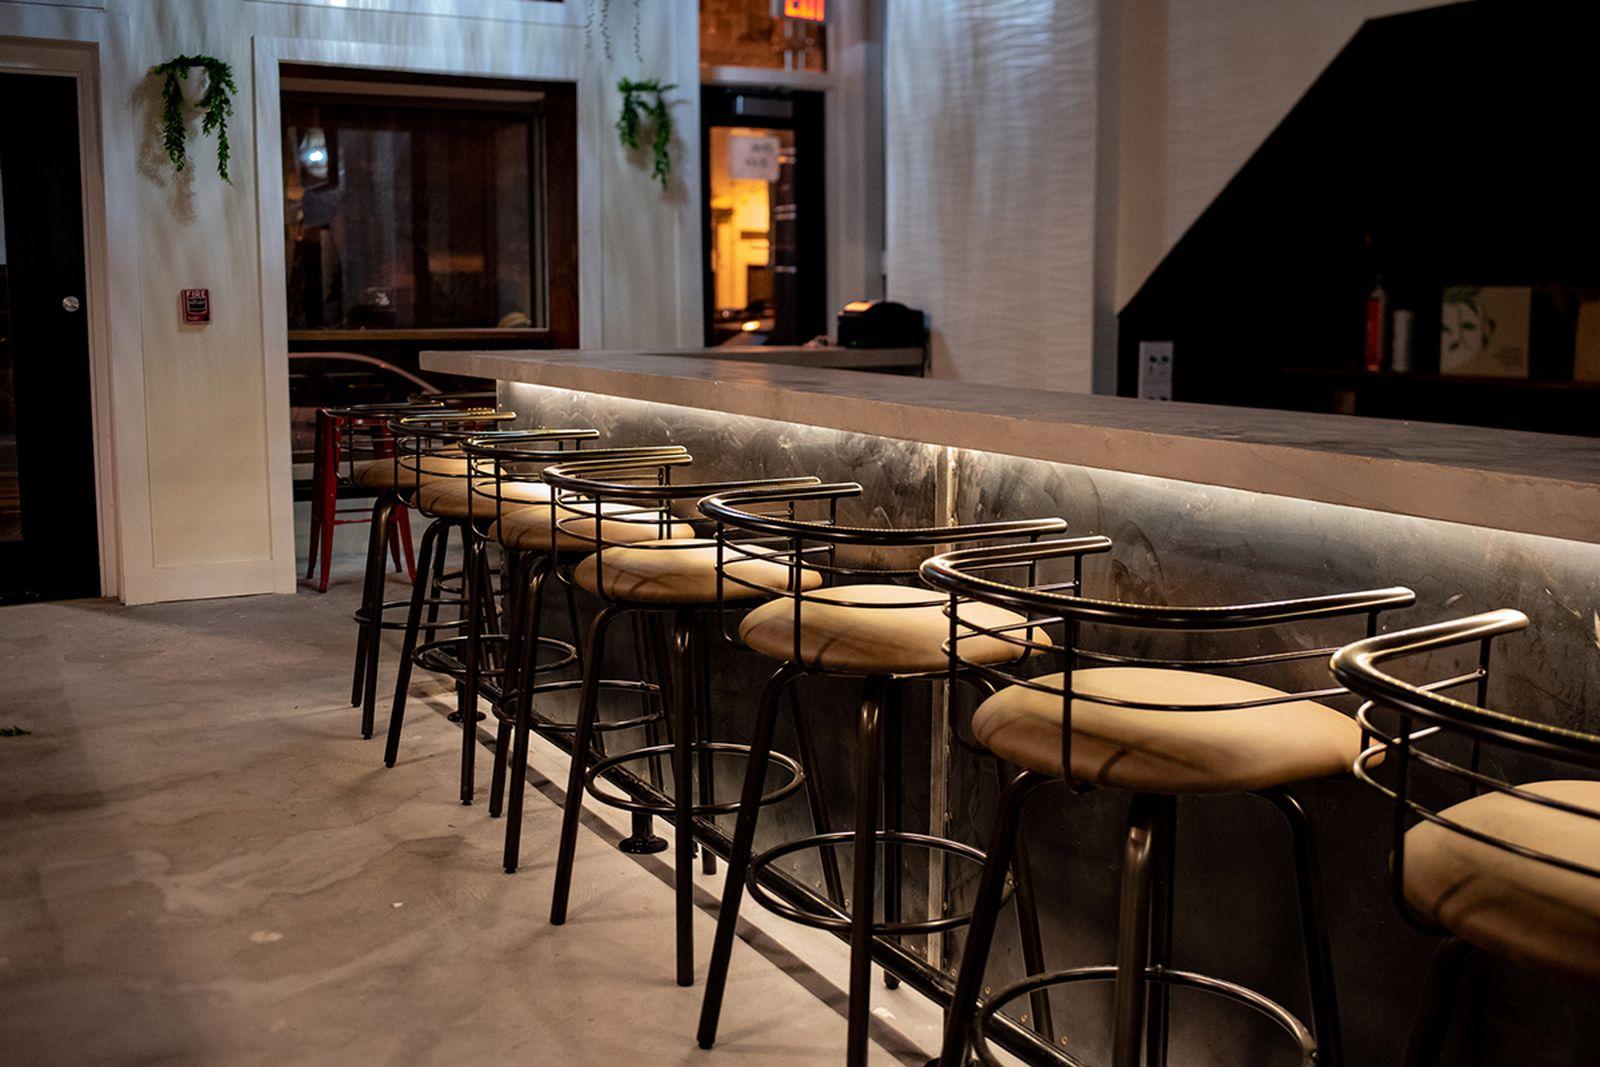 pusha-t-cocktail-bar-washington-dc-03